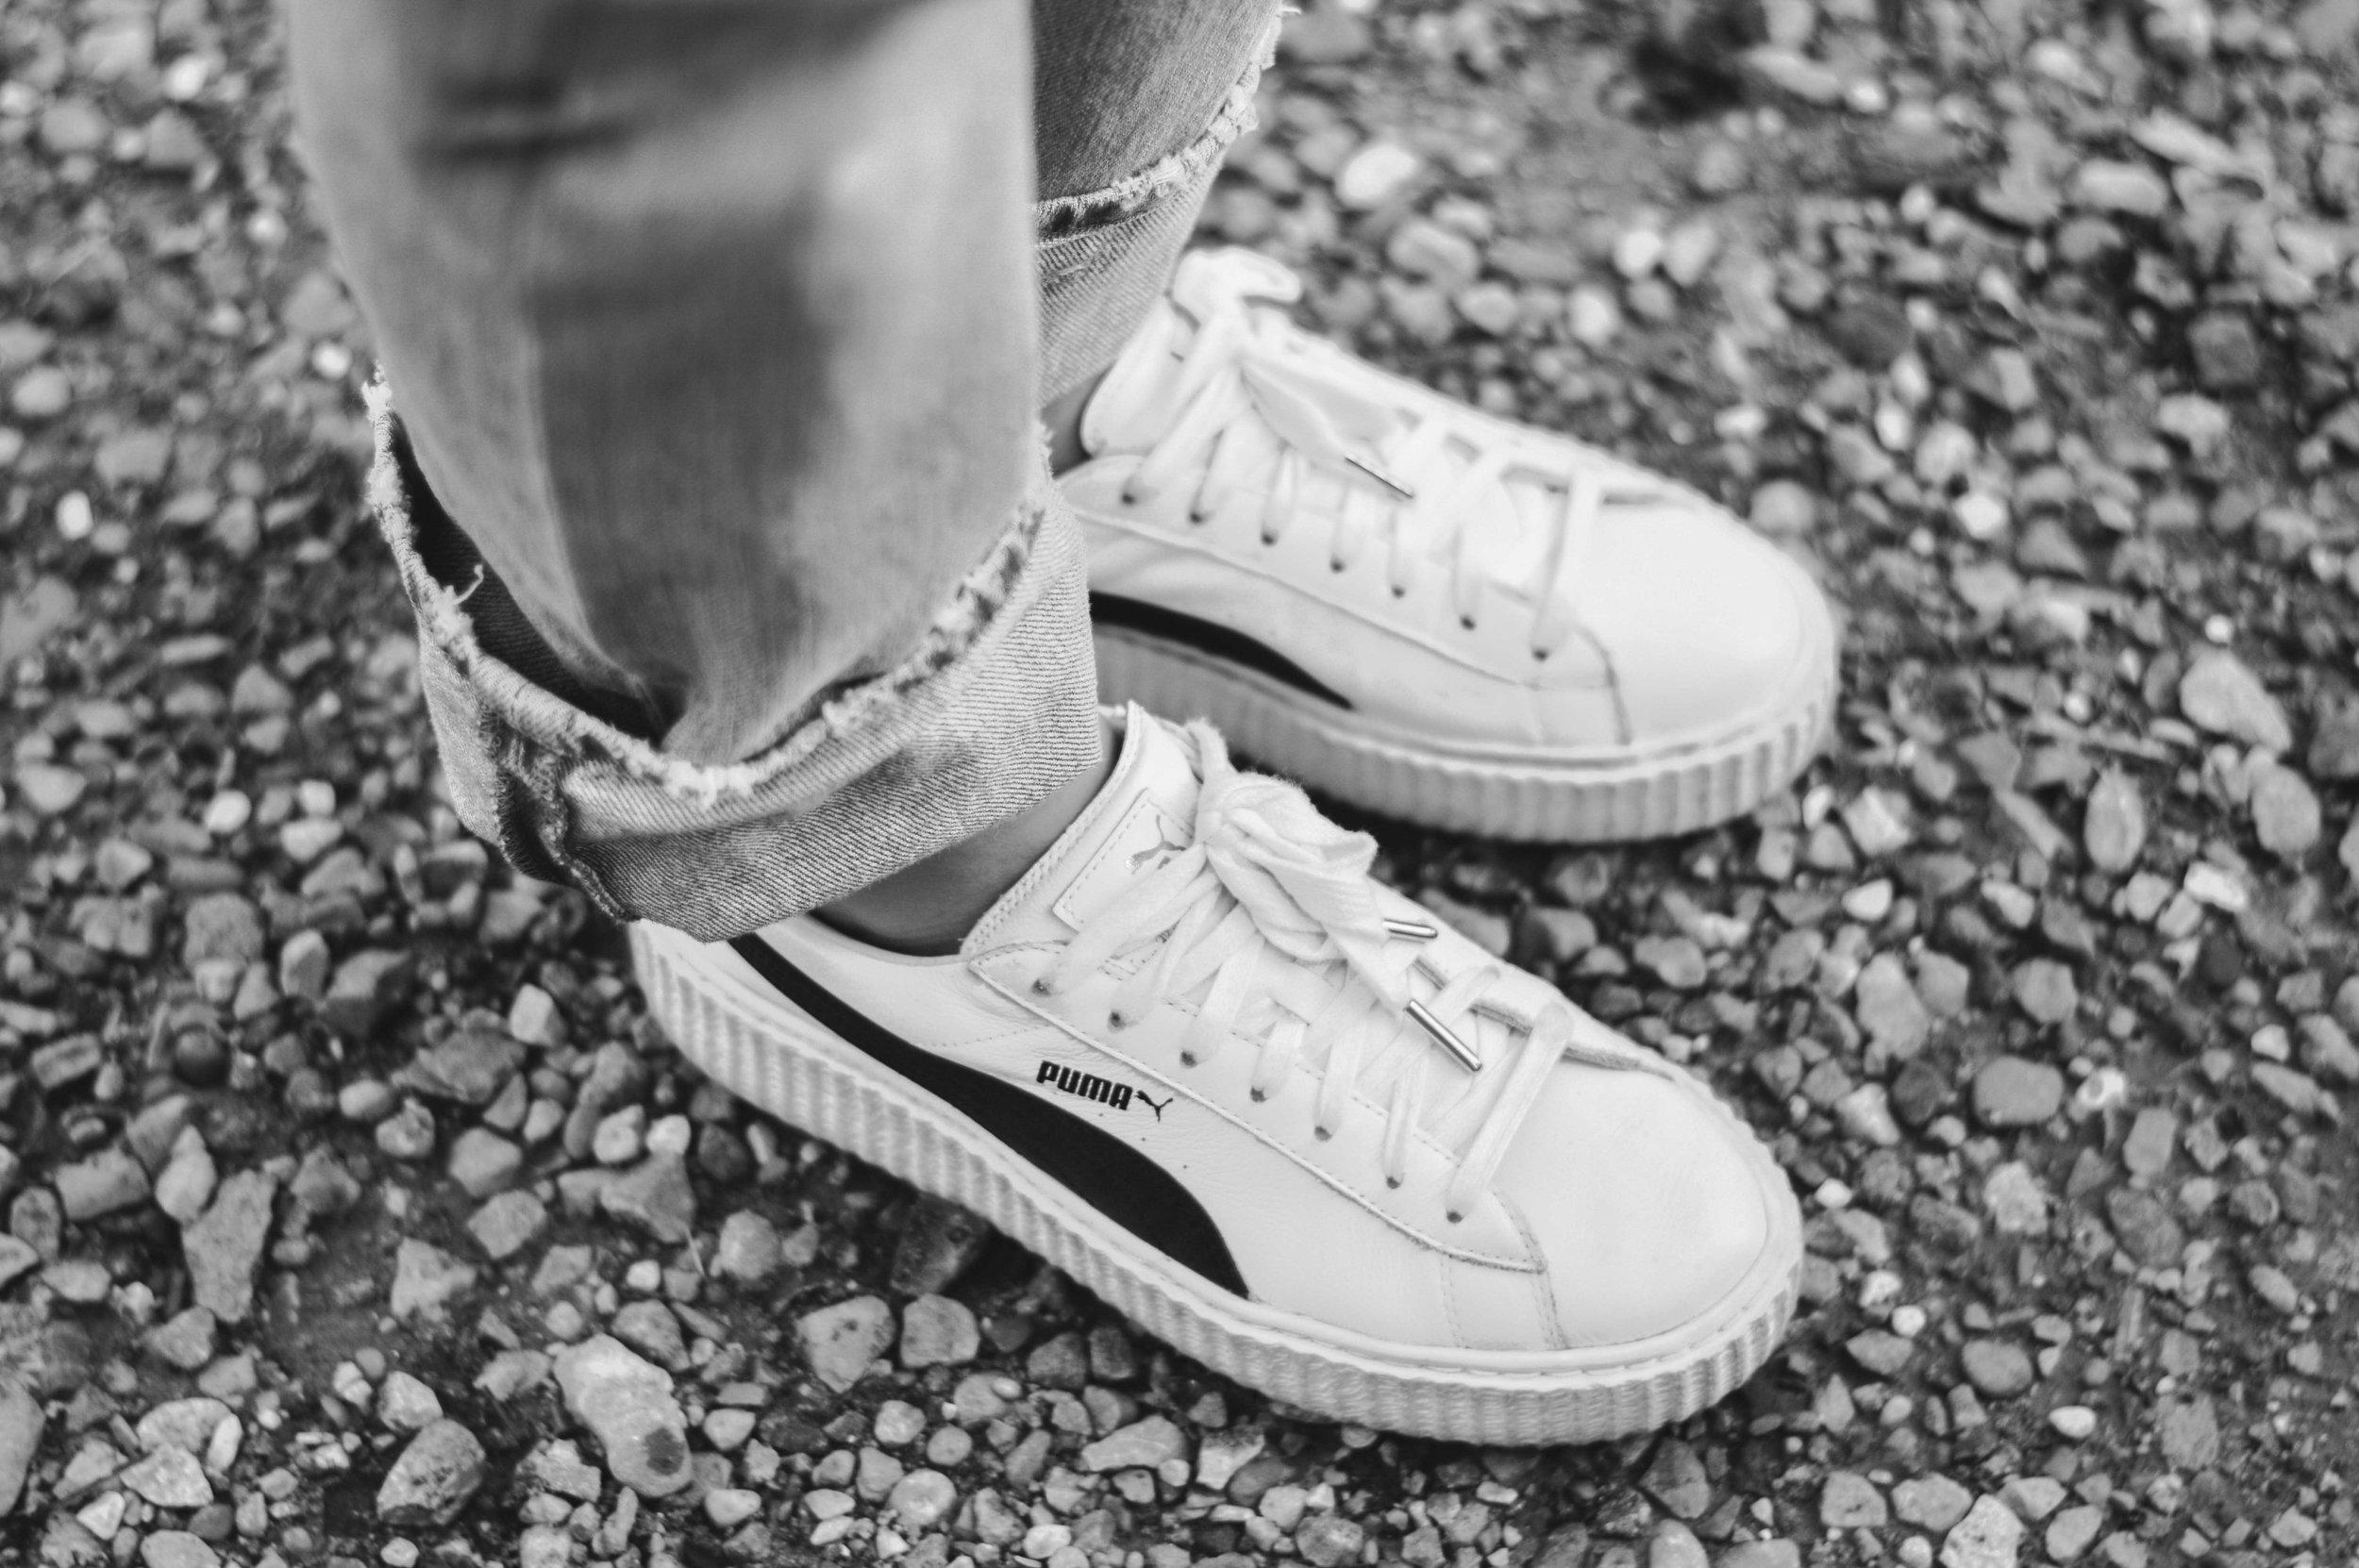 Puma shoes  Photo- Beth Jackson